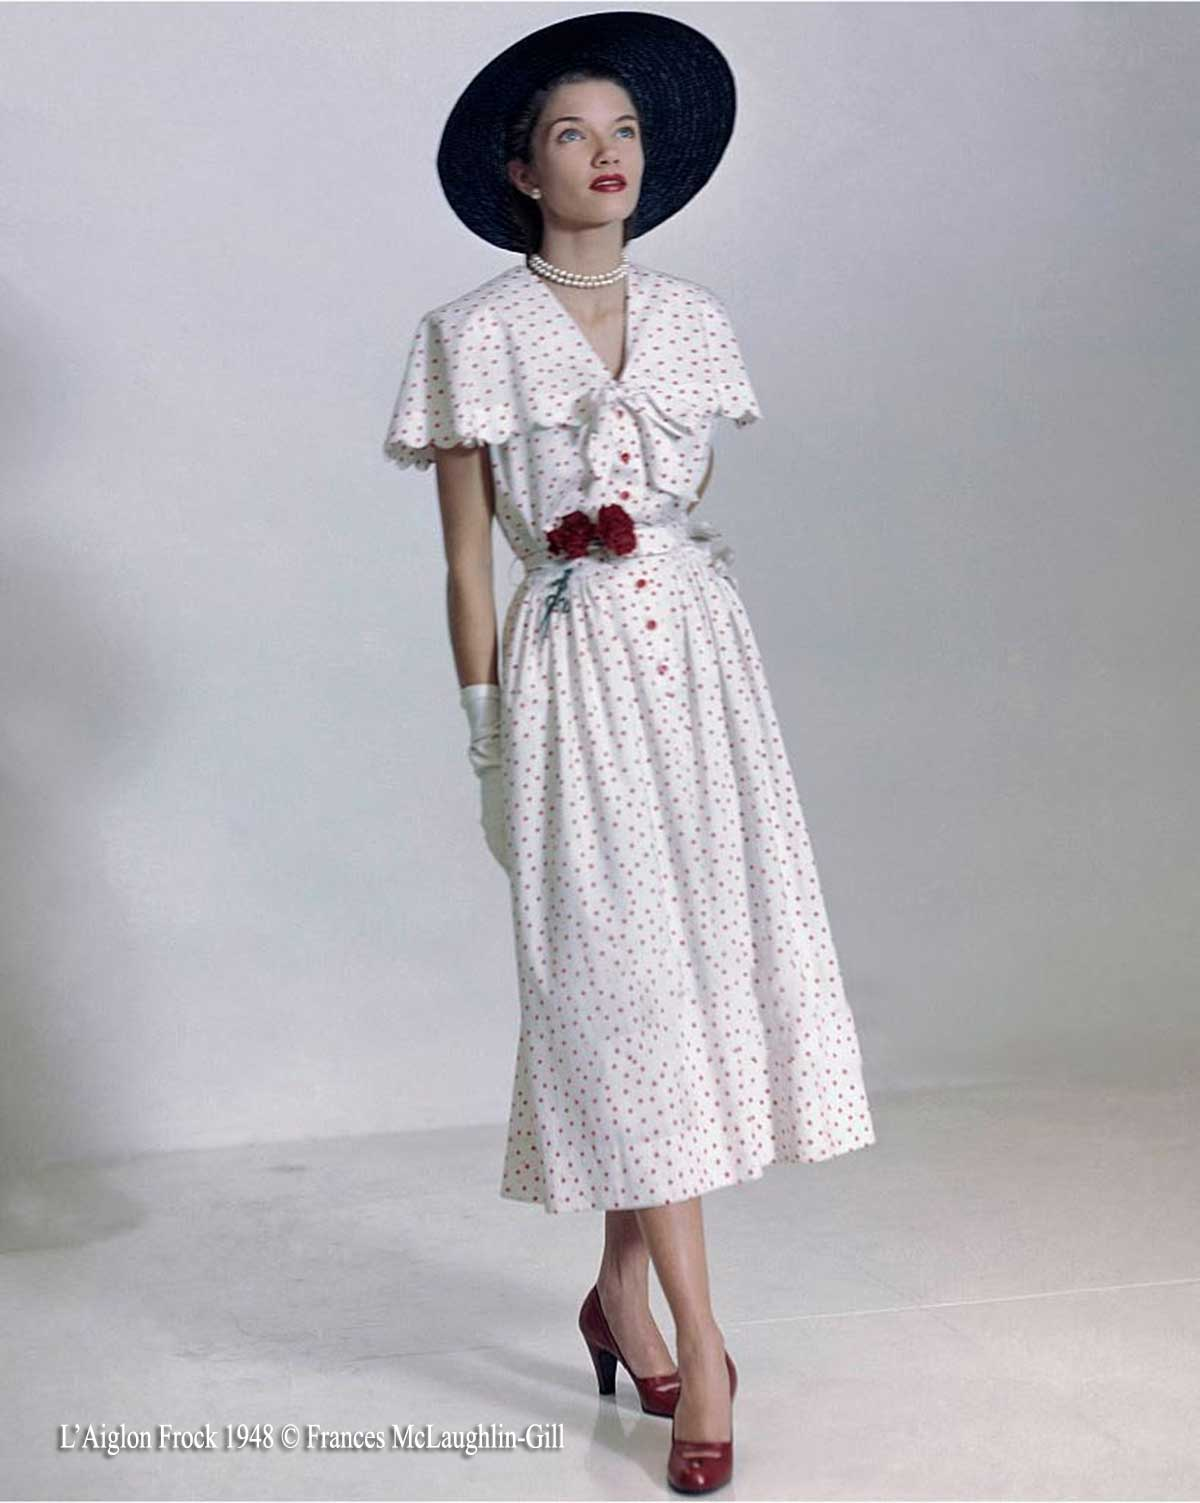 L-Aiglon-Frock-1948--Frances-McLaughlin-Gill